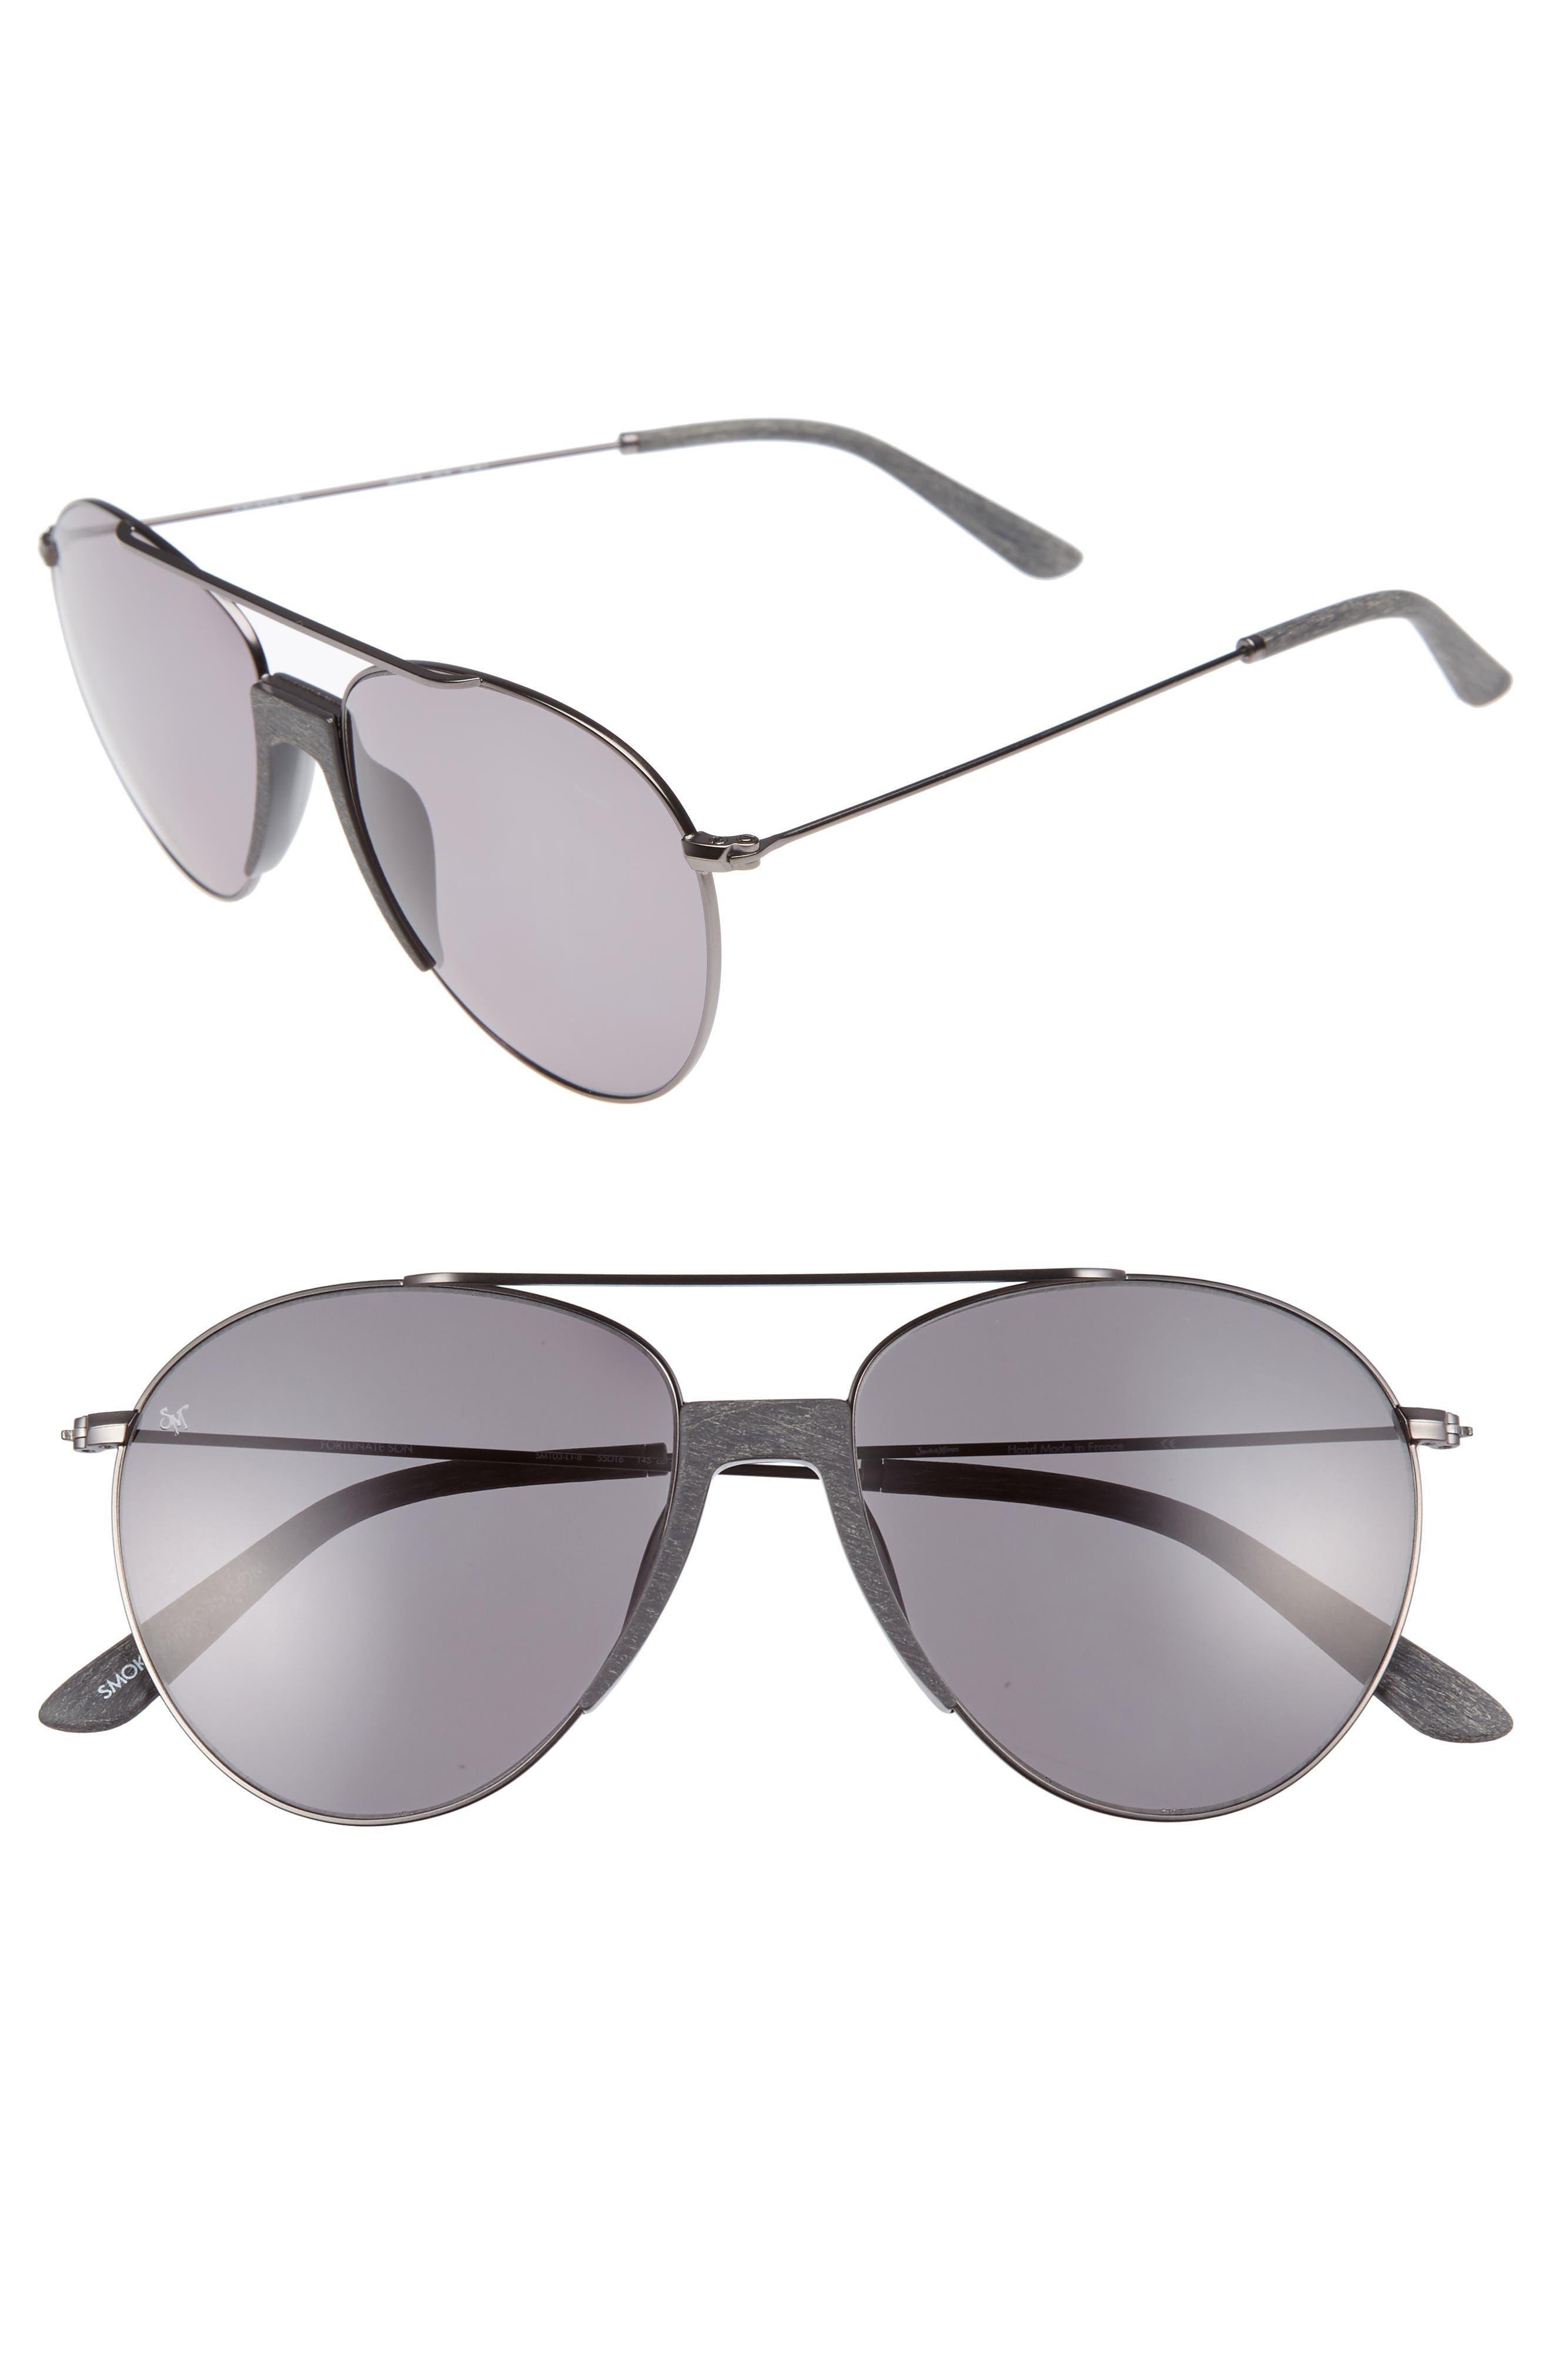 SMOKE X MIRRORS Fortunate Son 55mm Gradient Lens Aviator Sunglasses